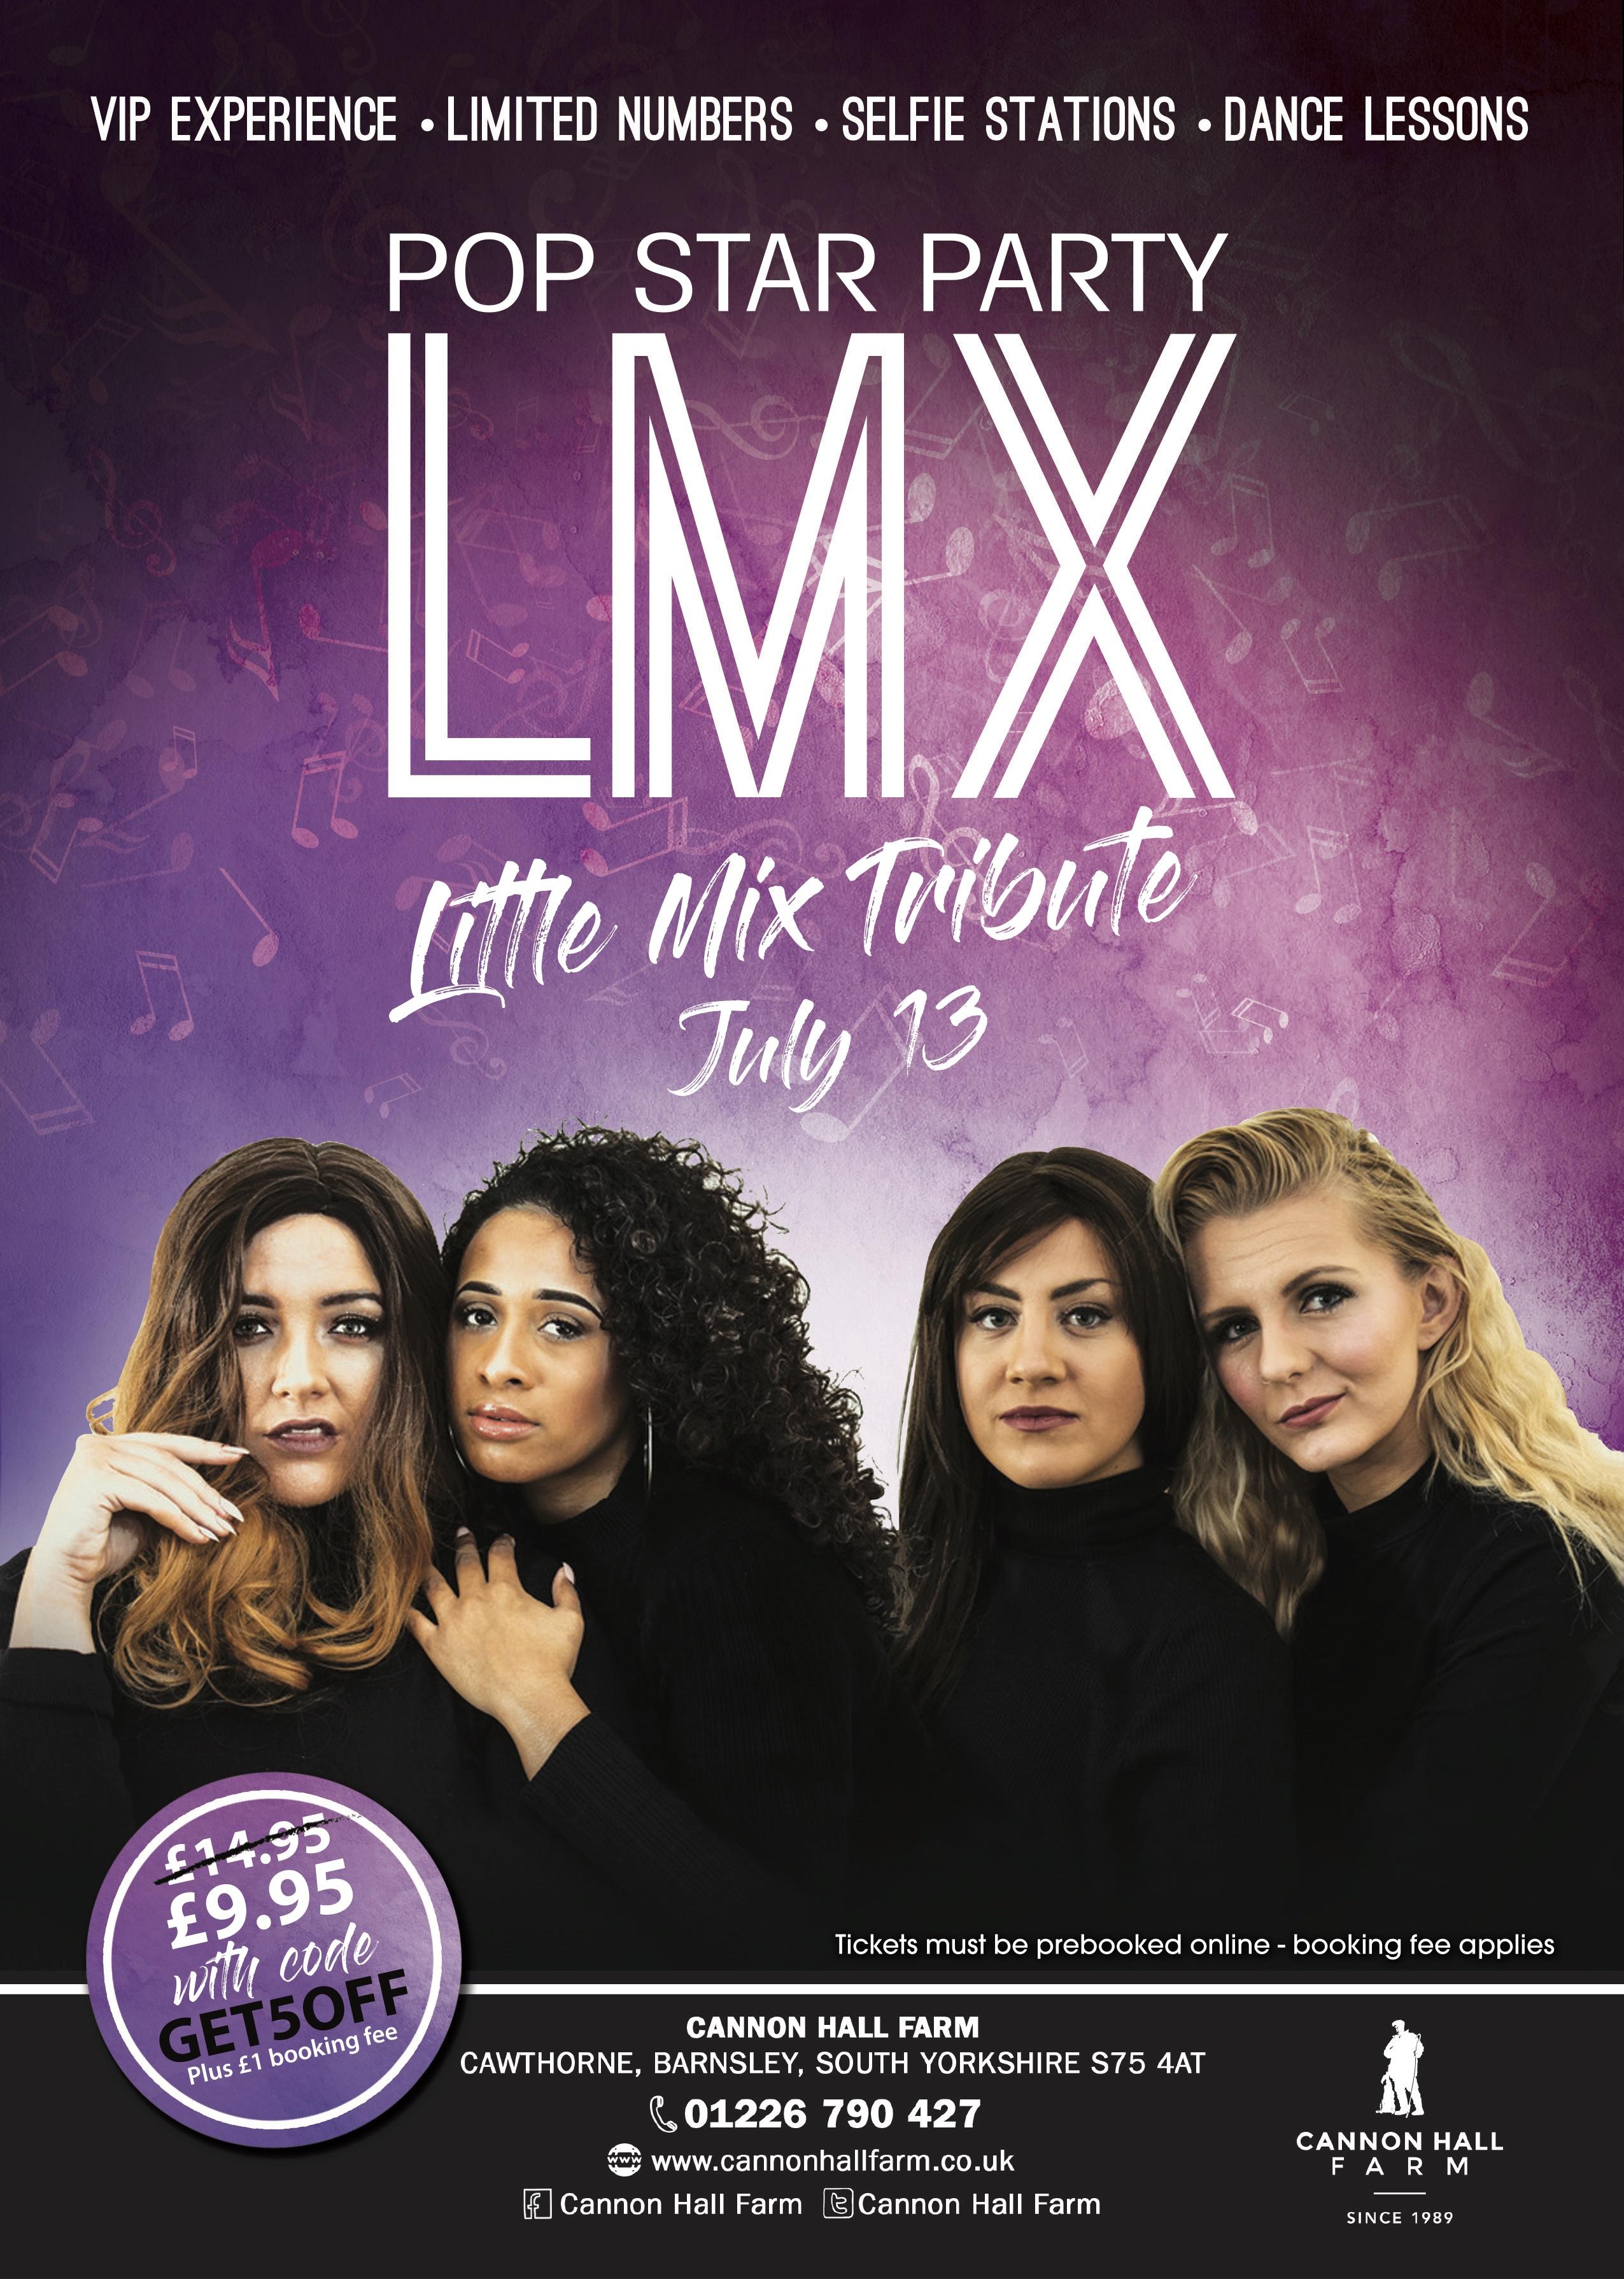 Little Mix Tribute web